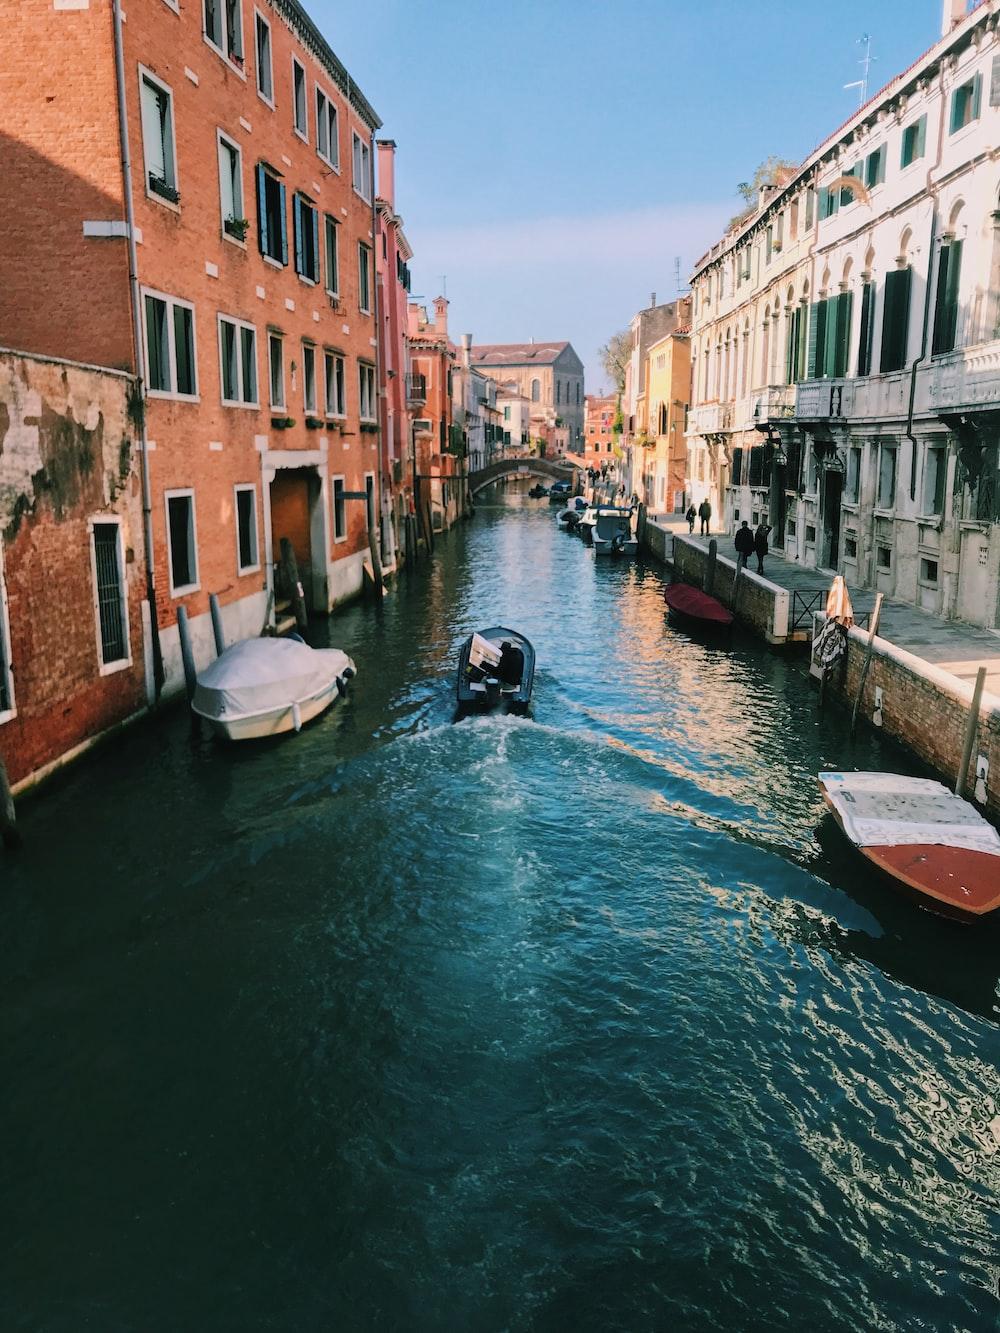 canal between buildings